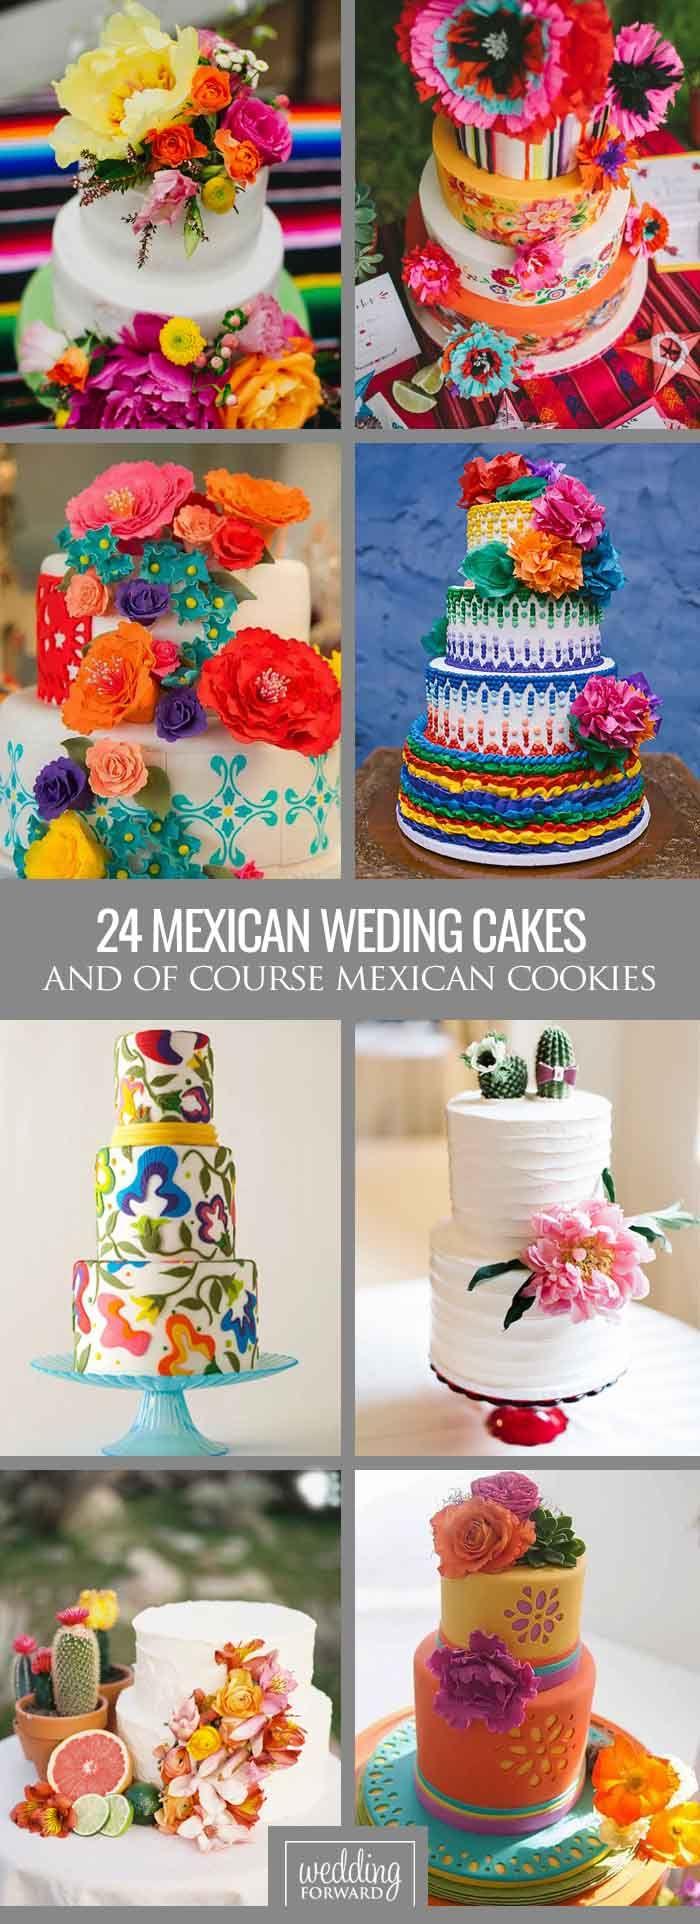 24 ideas de hermosos y coloridos pasteles con temática mexicana.